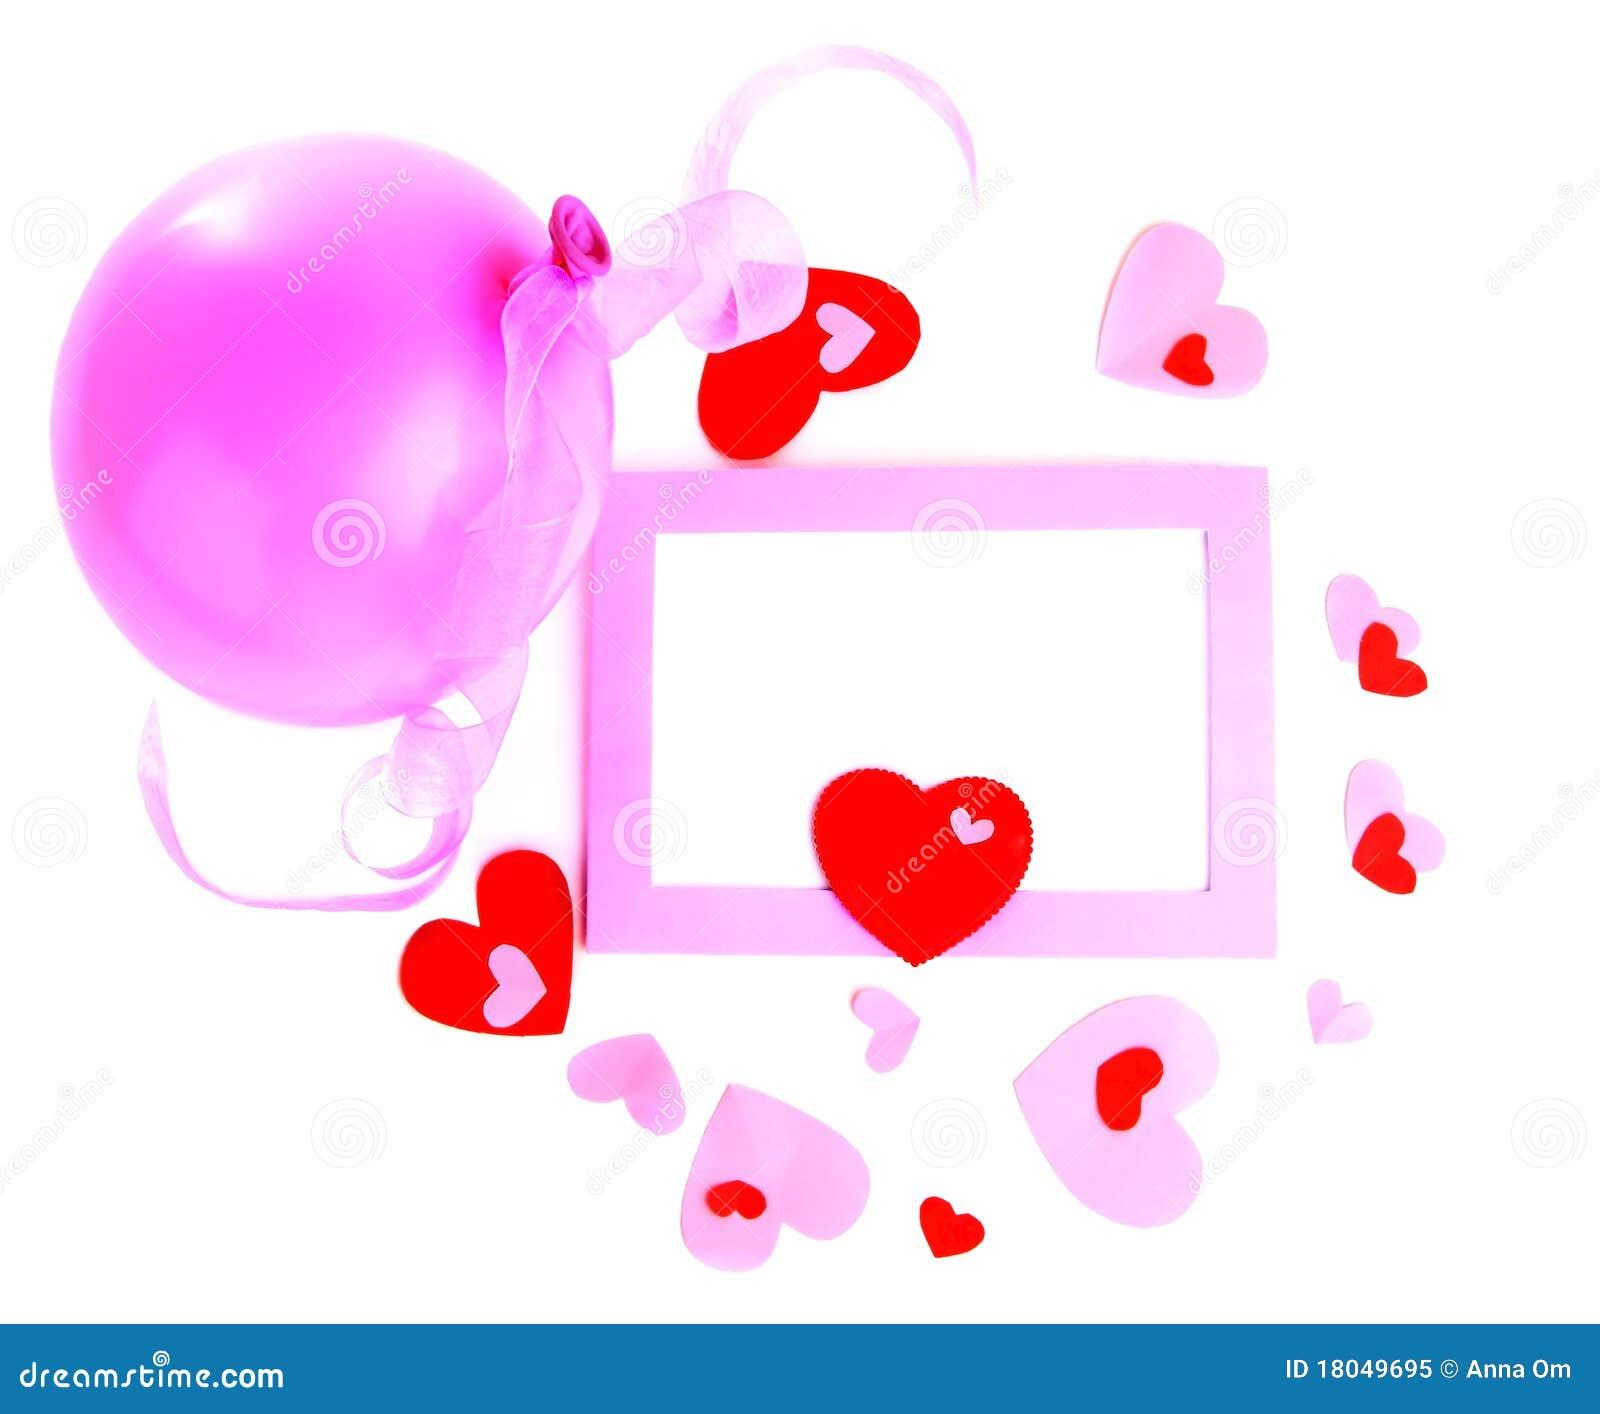 romantic stock photo images 427450 romantic royalty free